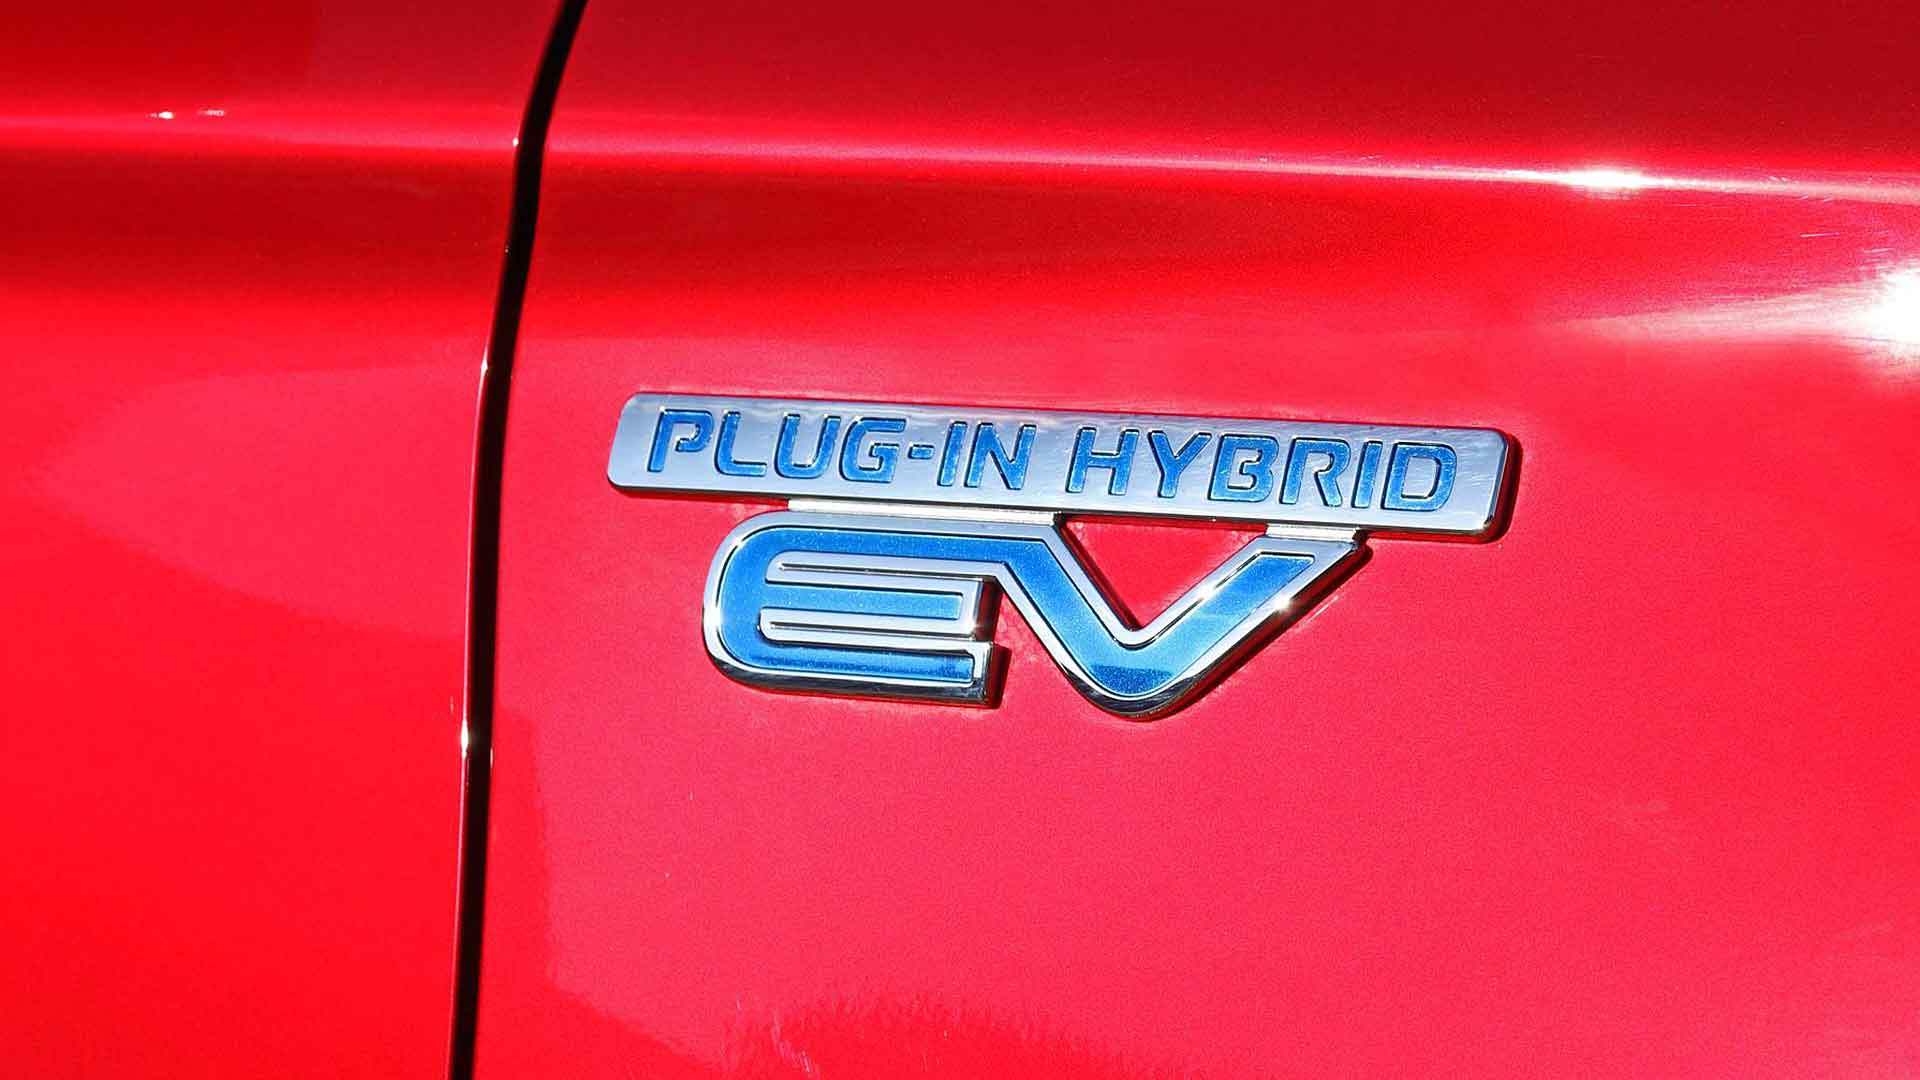 Plug-in Hybrid PHEV logo